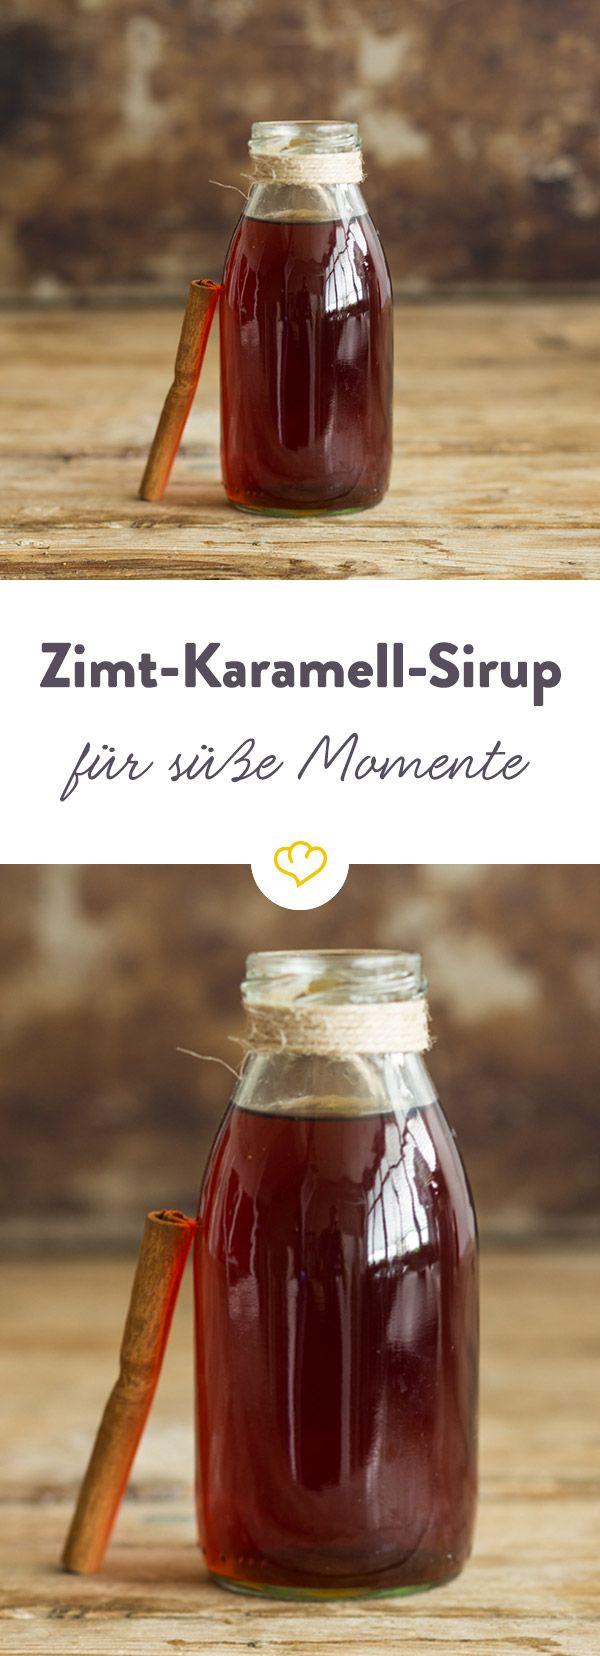 Zimt-Karamell-Sirup #fooddiy